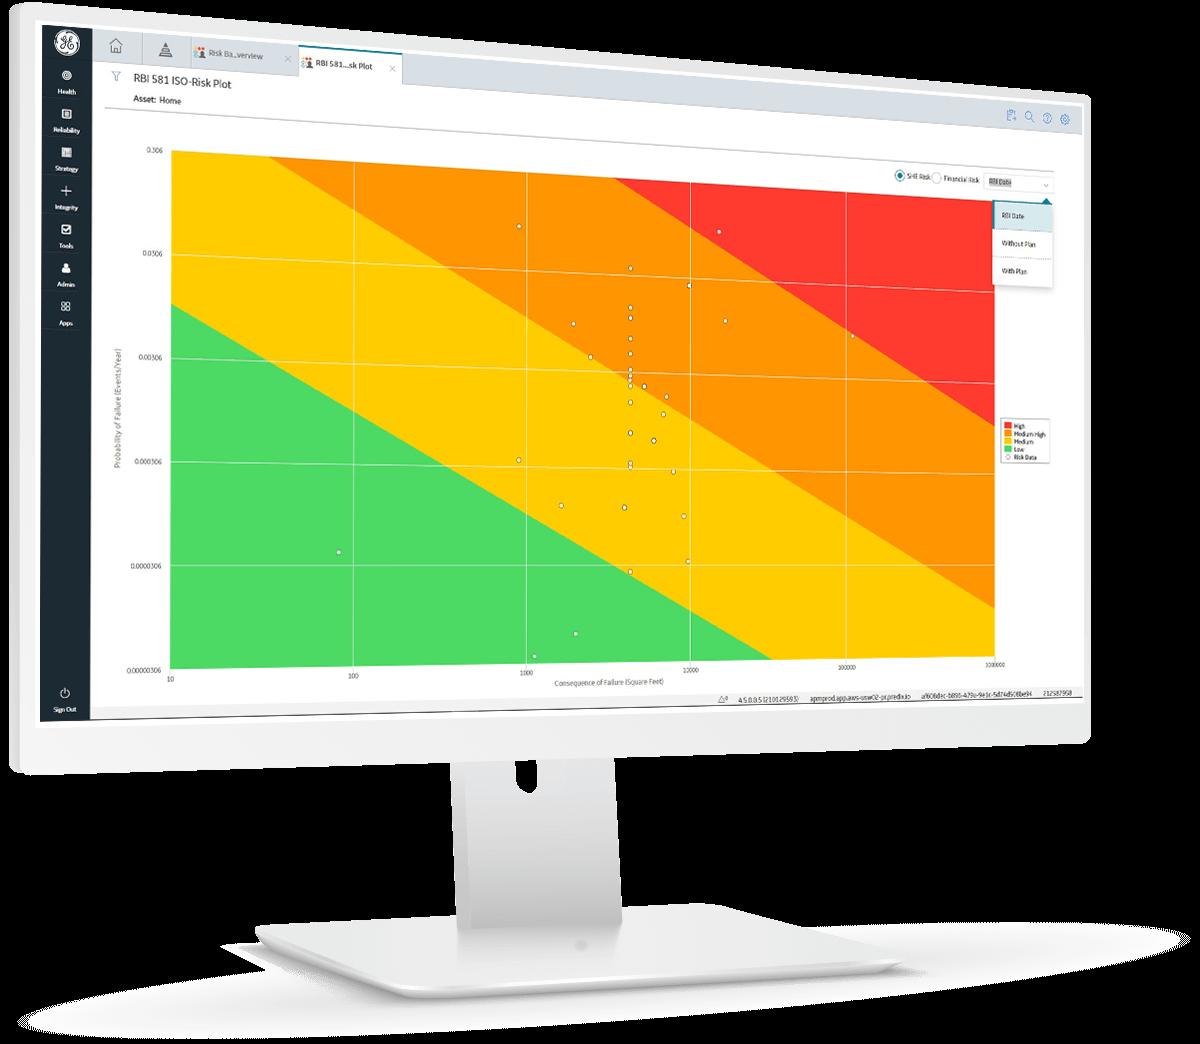 GE Digital's APM Integrity software enables risk-based inspection strategies